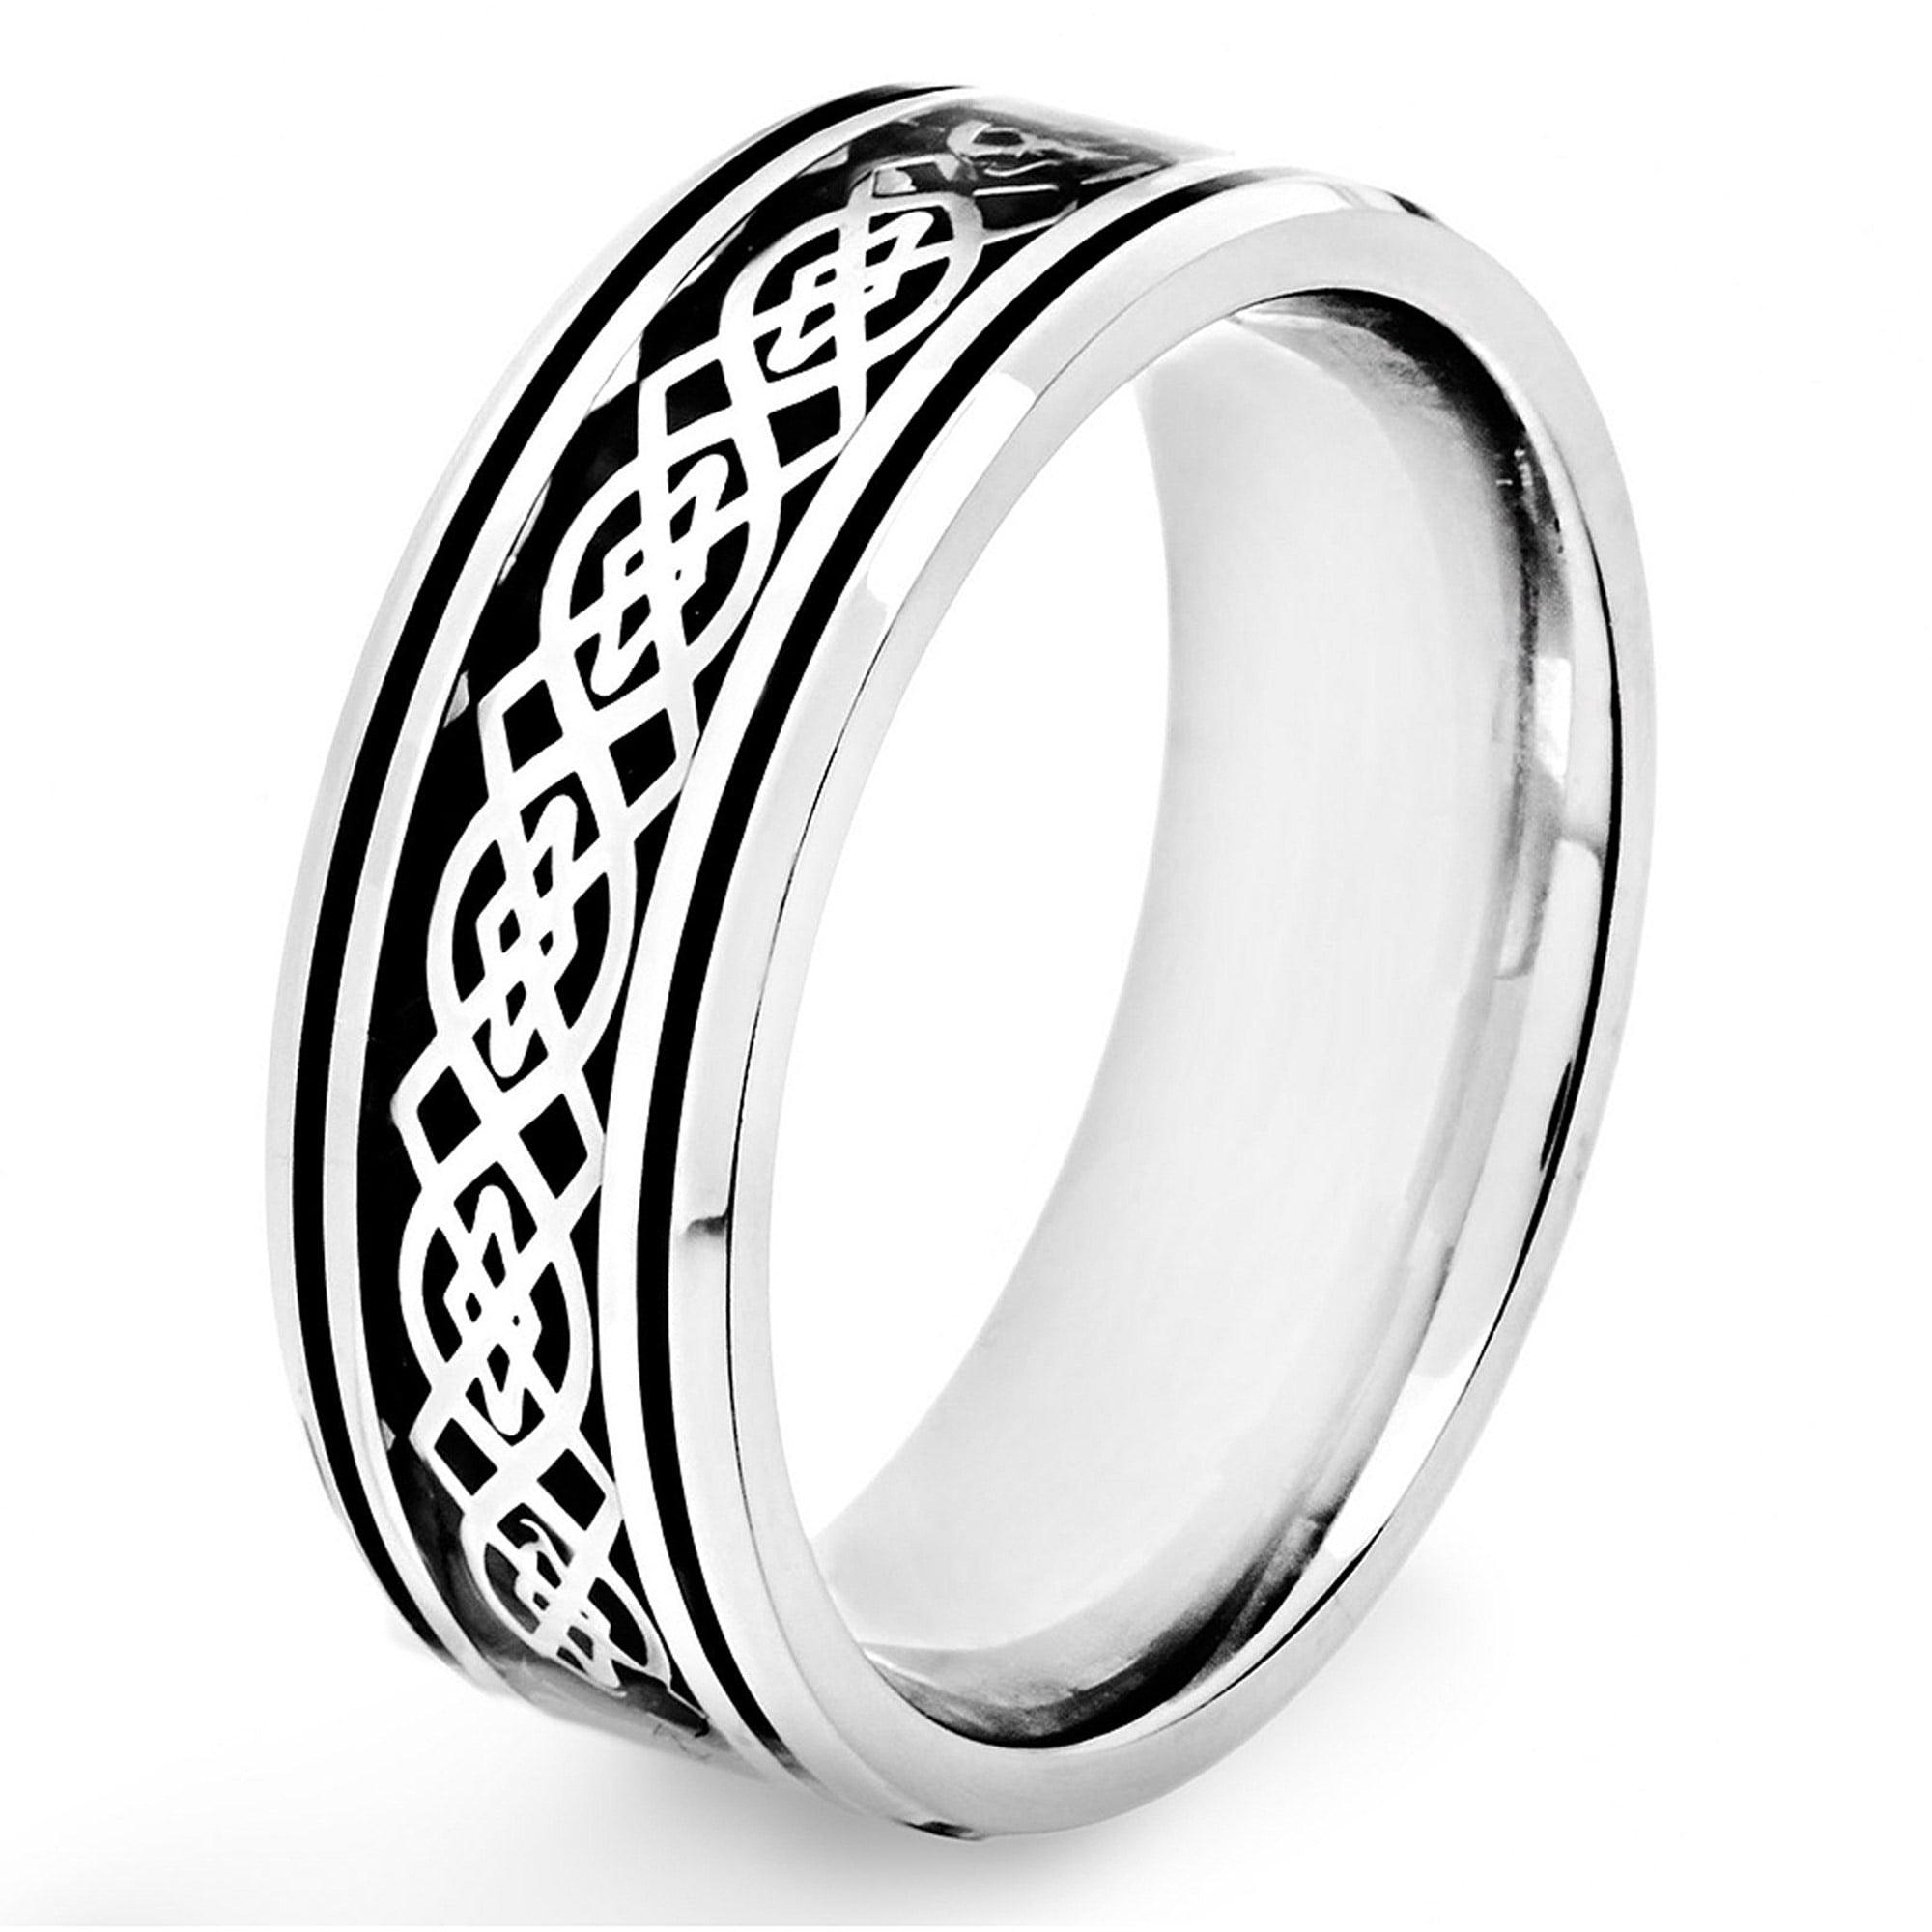 Crucible Stainless Steel Black Carbon Fiber Celtic Knot Design Ring